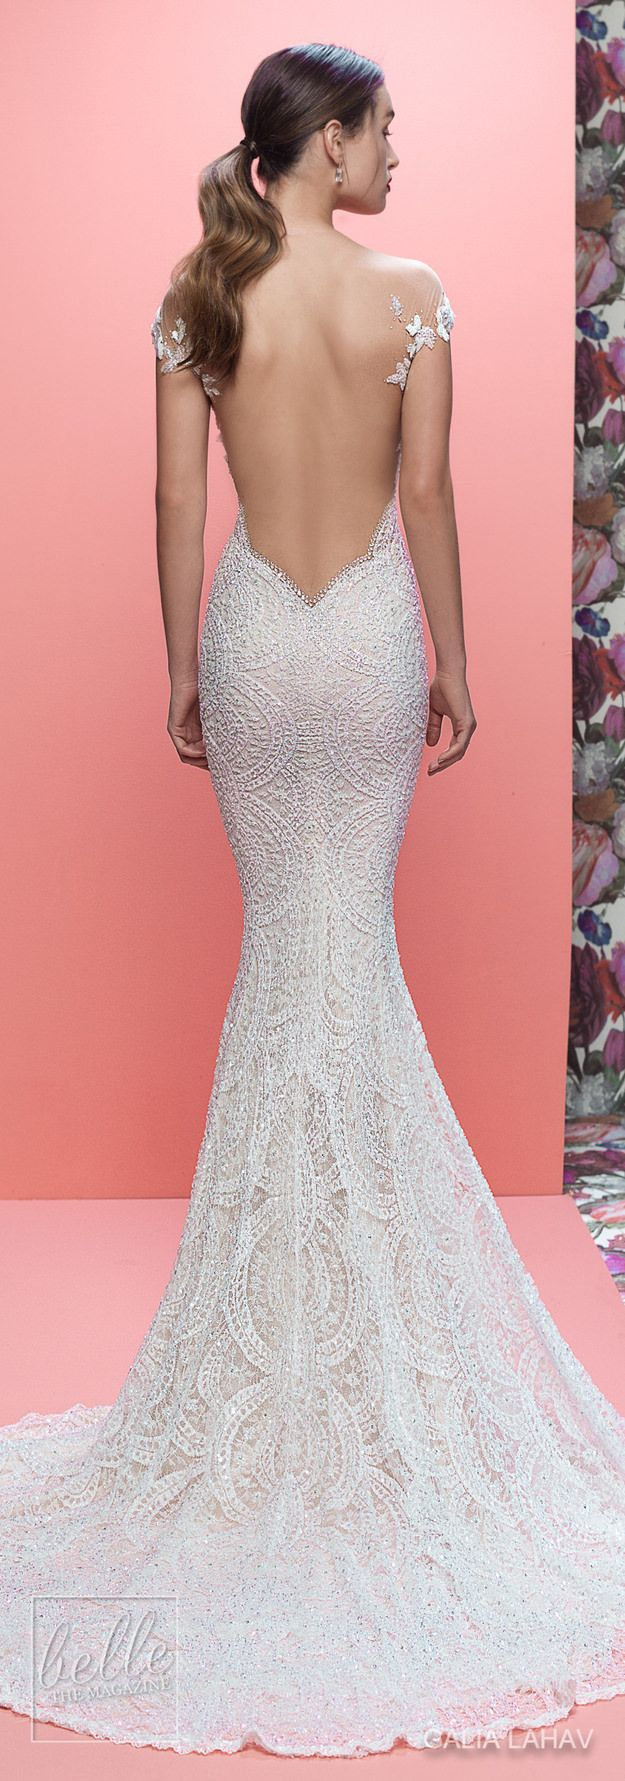 918 best Wedding images on Pinterest   Dream wedding, Getting ...